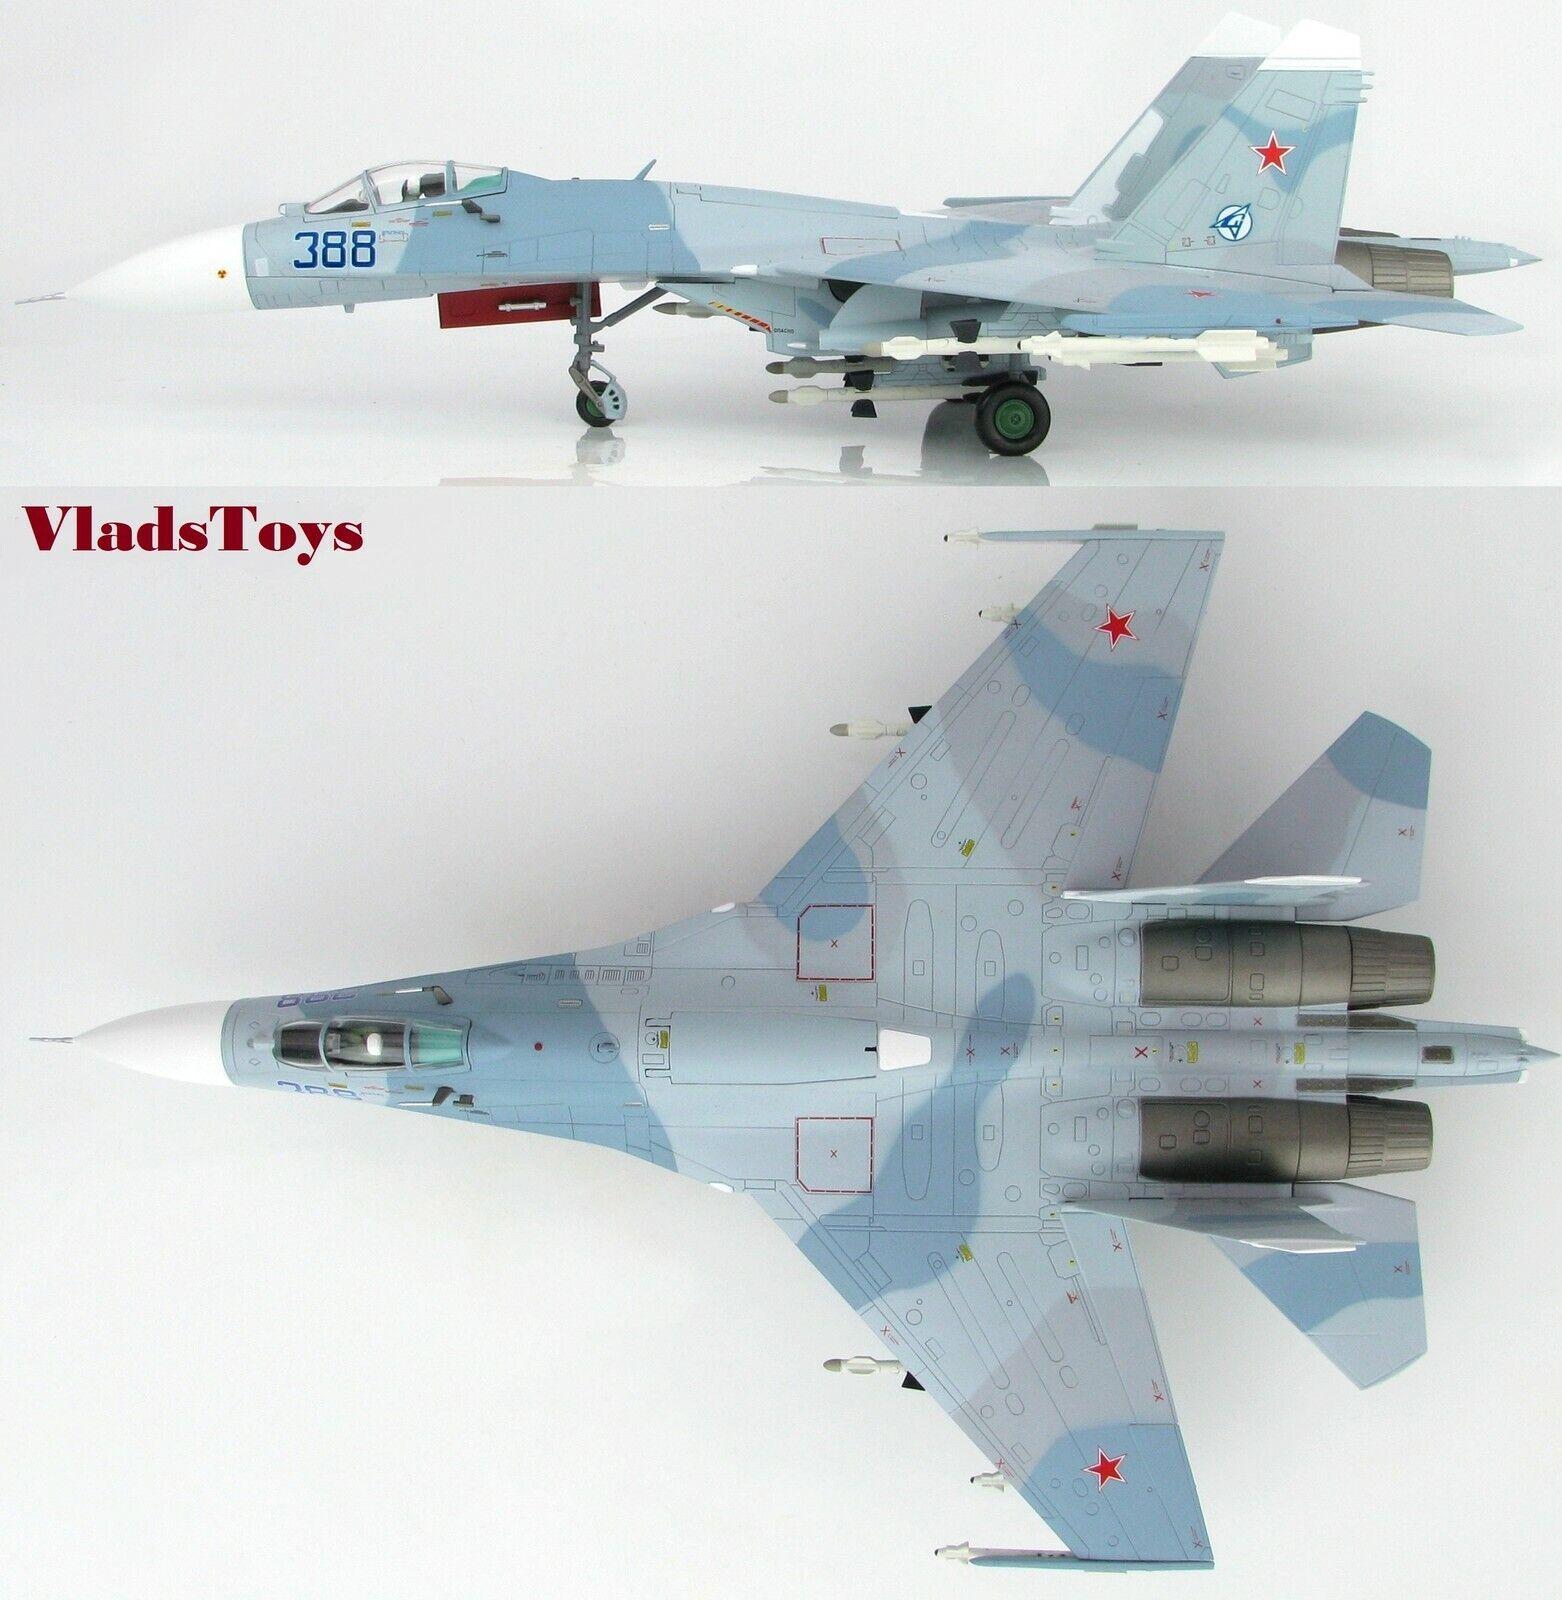 Hobby Master 1 72 Sukhoi Su-27 Flanker-B Russan Af Bleu 388 Paris Airshow HA6003